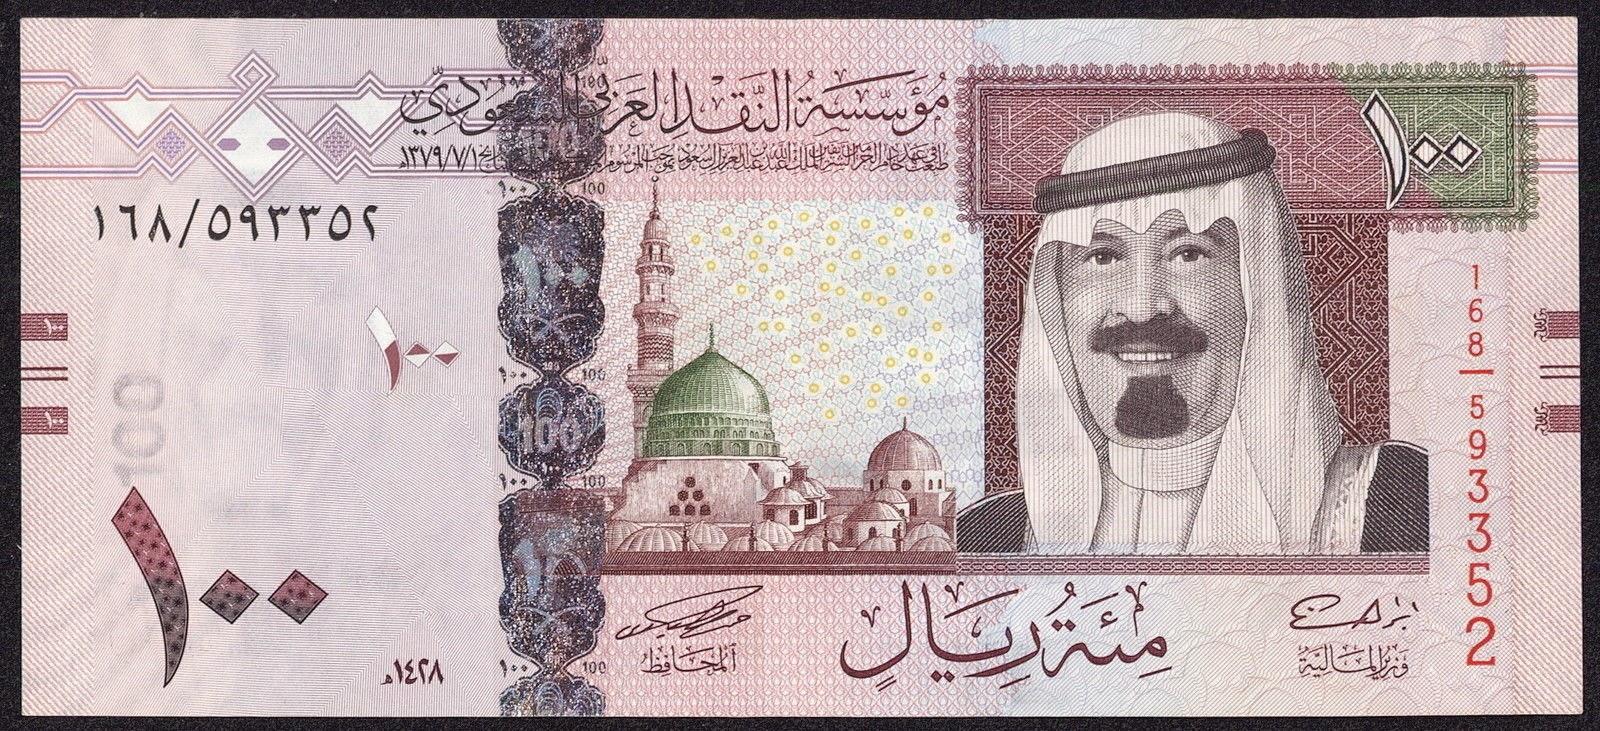 Saudi Arabia money currency 100 Riyal note